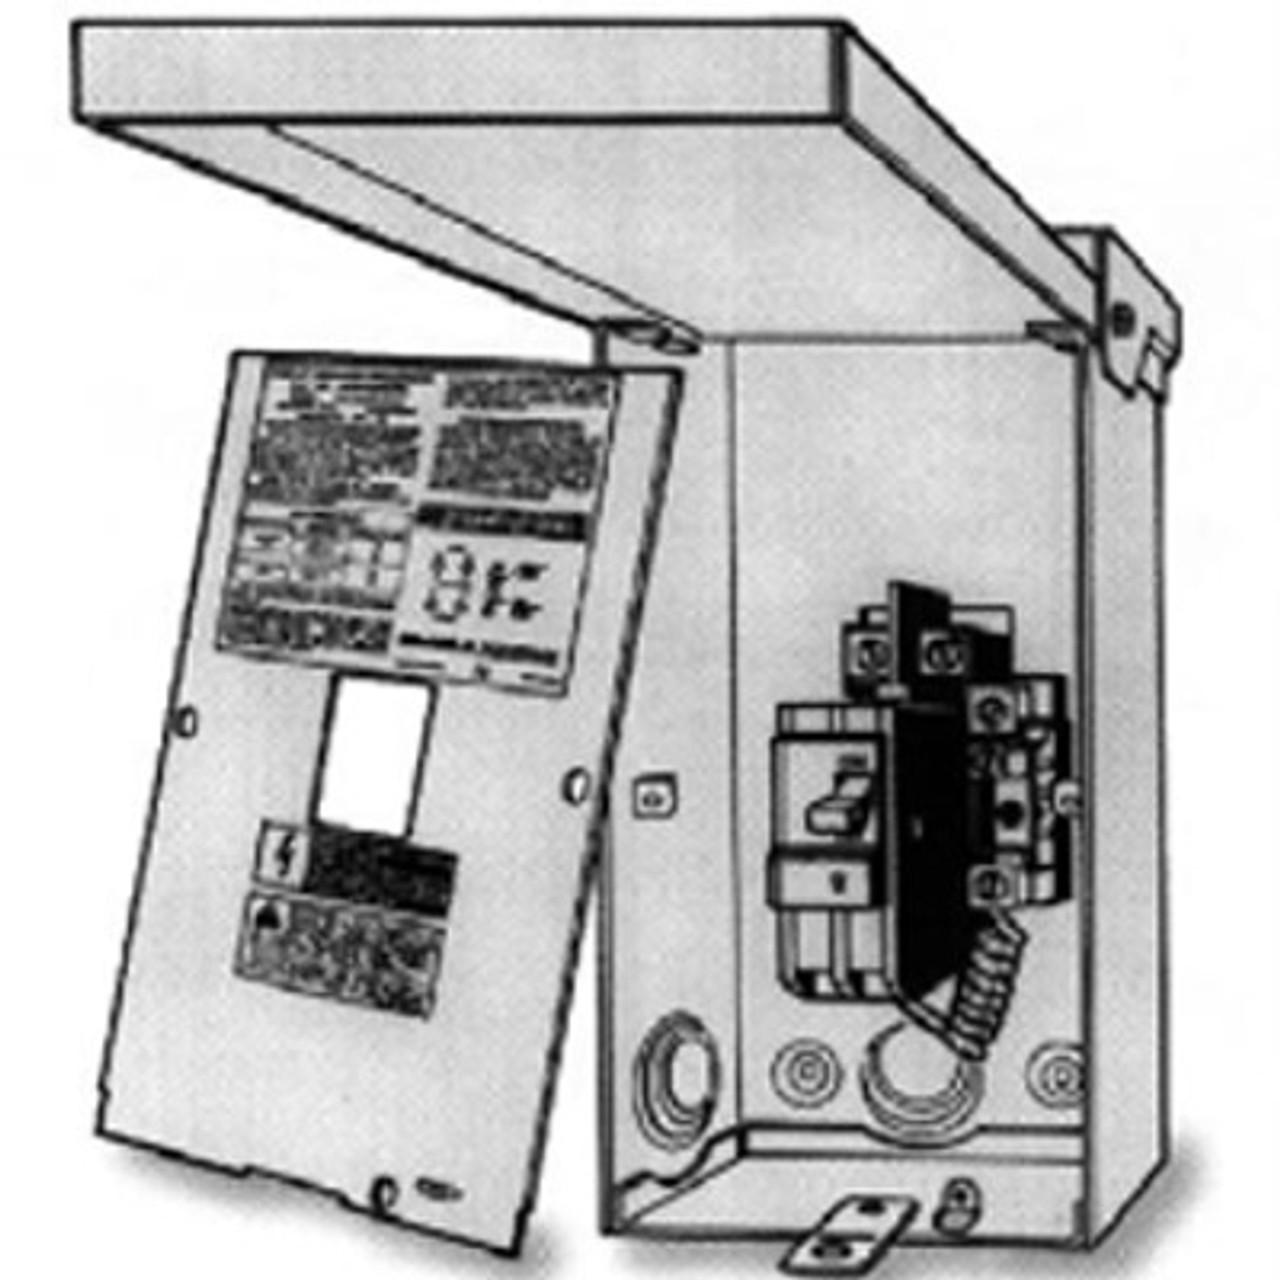 Wiring Diagram For Hot Tub On Gfci Circuit Breaker Wiring Diagram